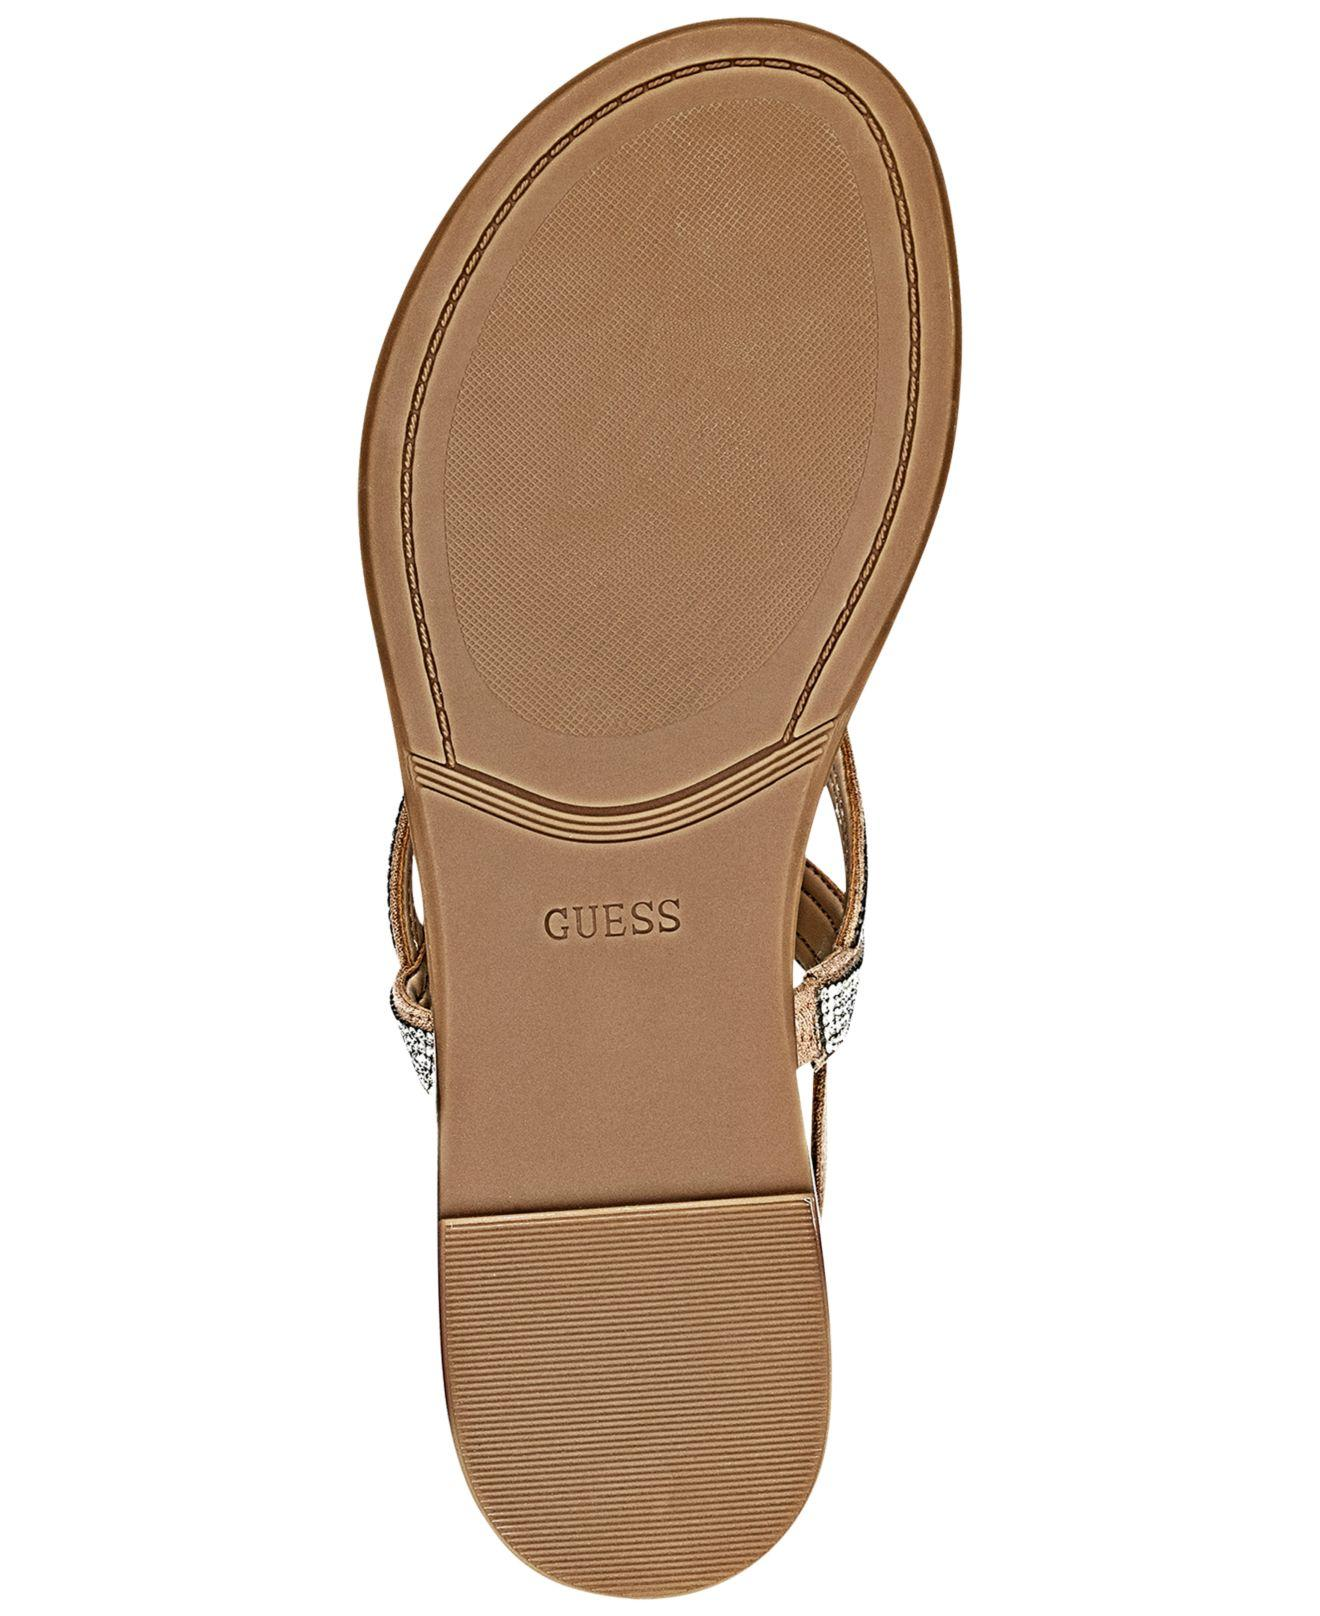 48215bab1 Lyst - Guess Women s Jabel Flat Sandals